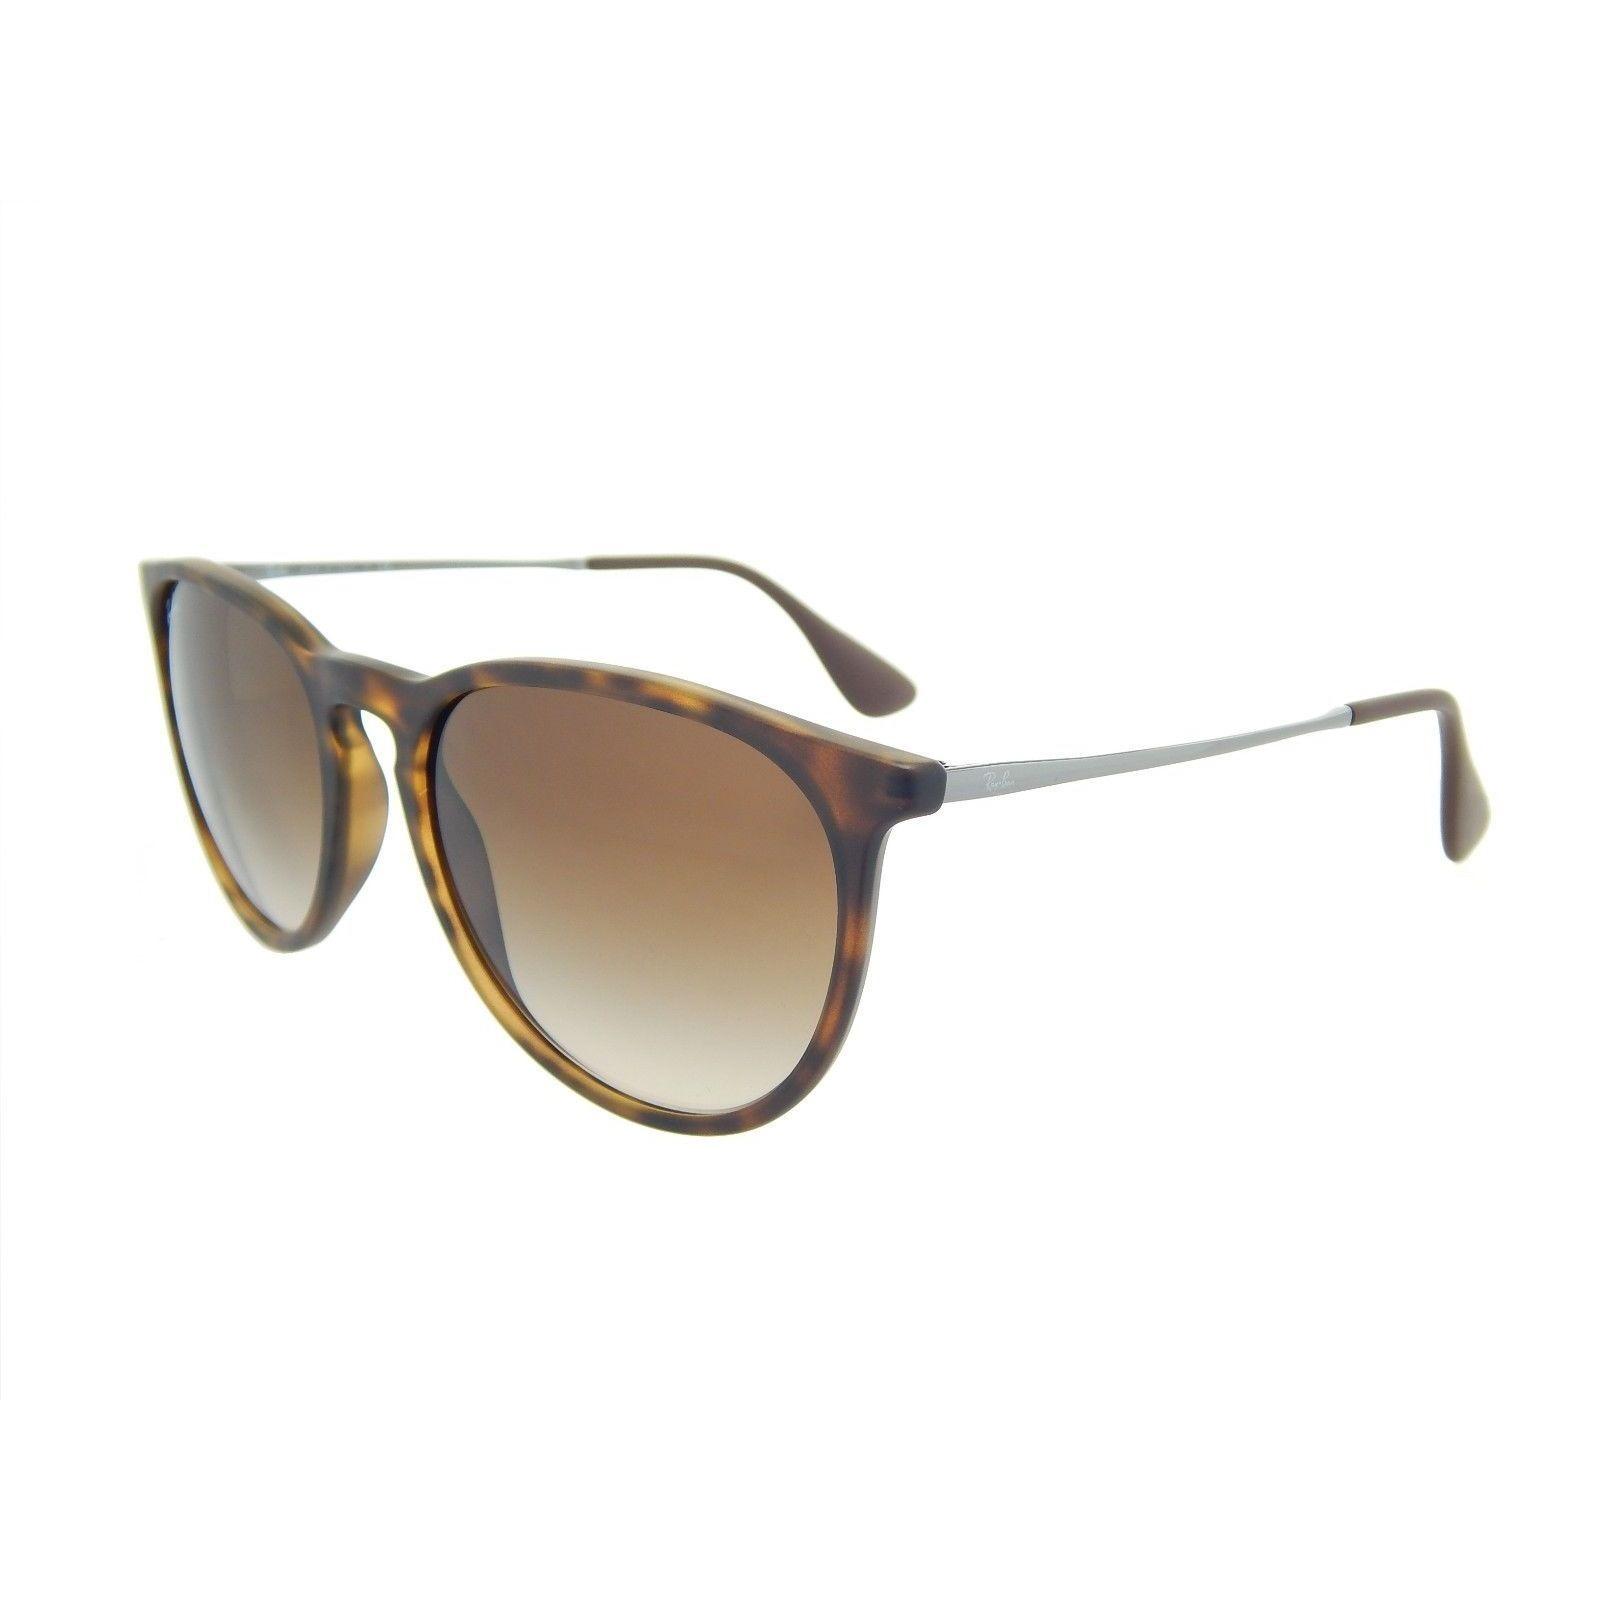 325ea4fa8 Ray-Ban Erika RB 4171 Unisex Tortoise/Gunmetal Frame Brown Gradient Lens  Sunglasses